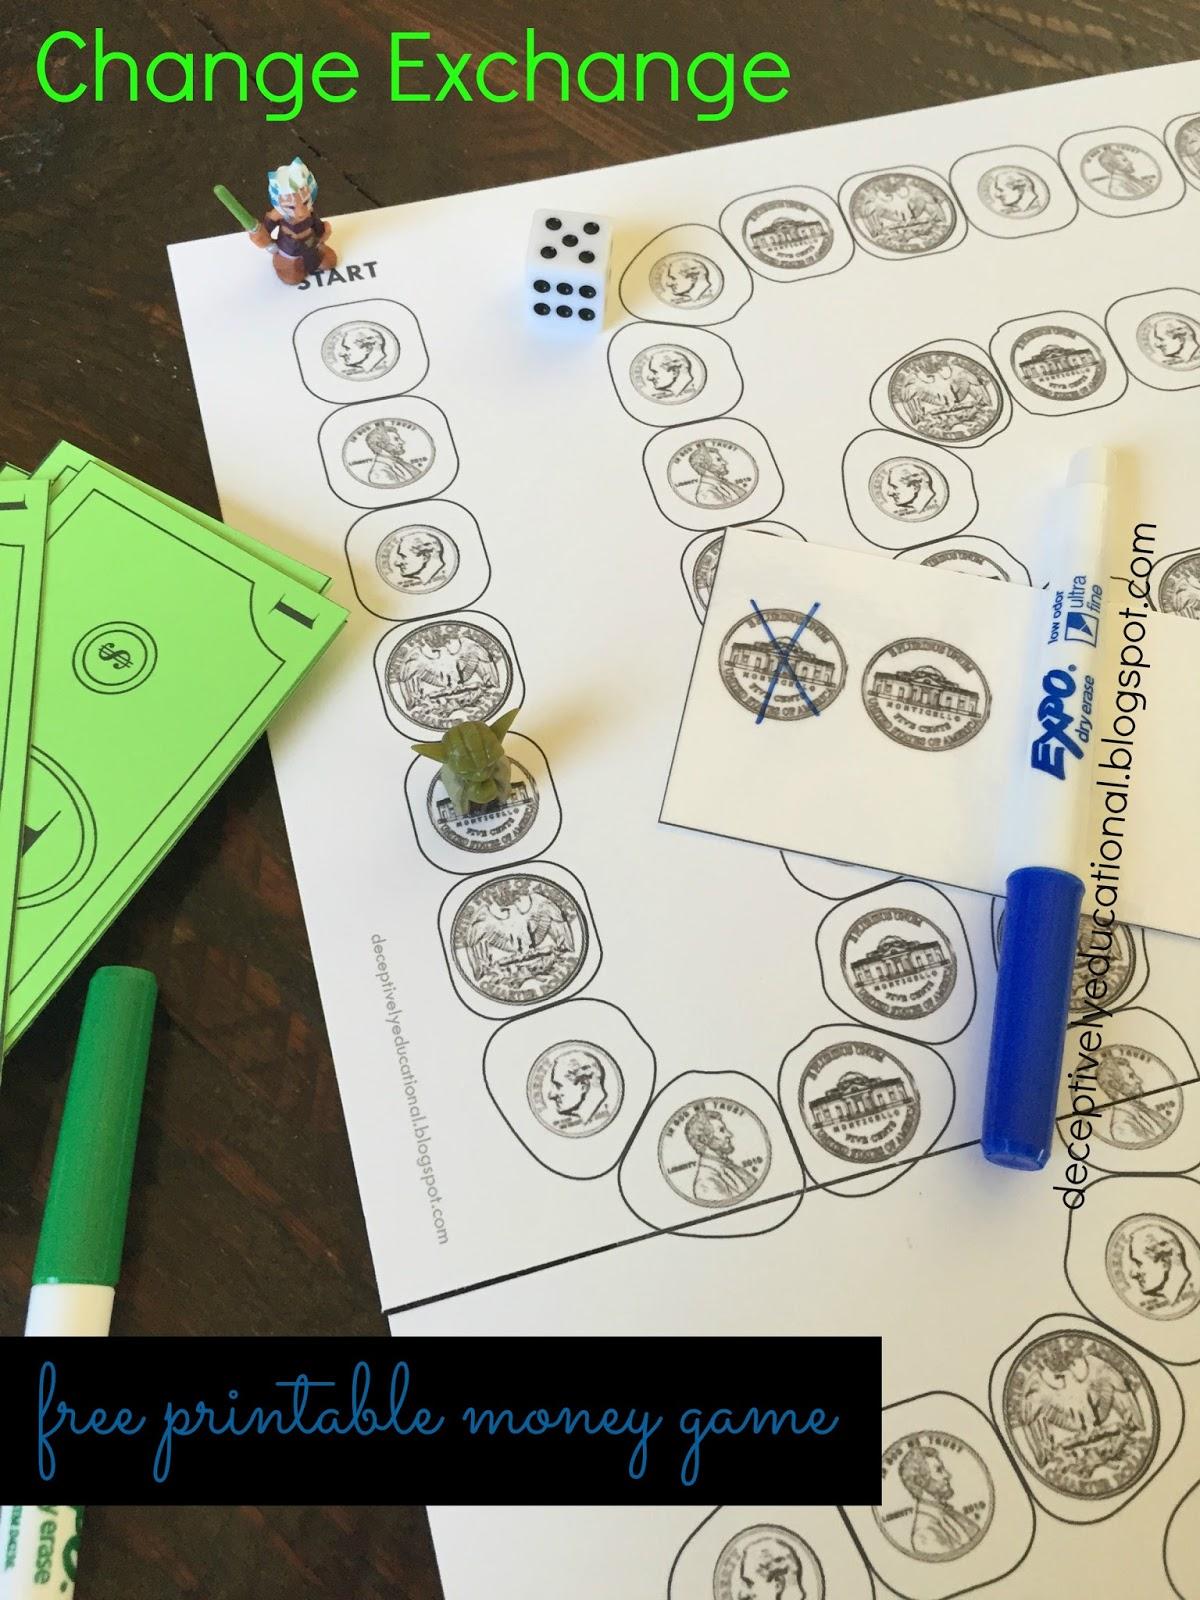 Change Exchange Free Printable Money Game Relentlessly Fun